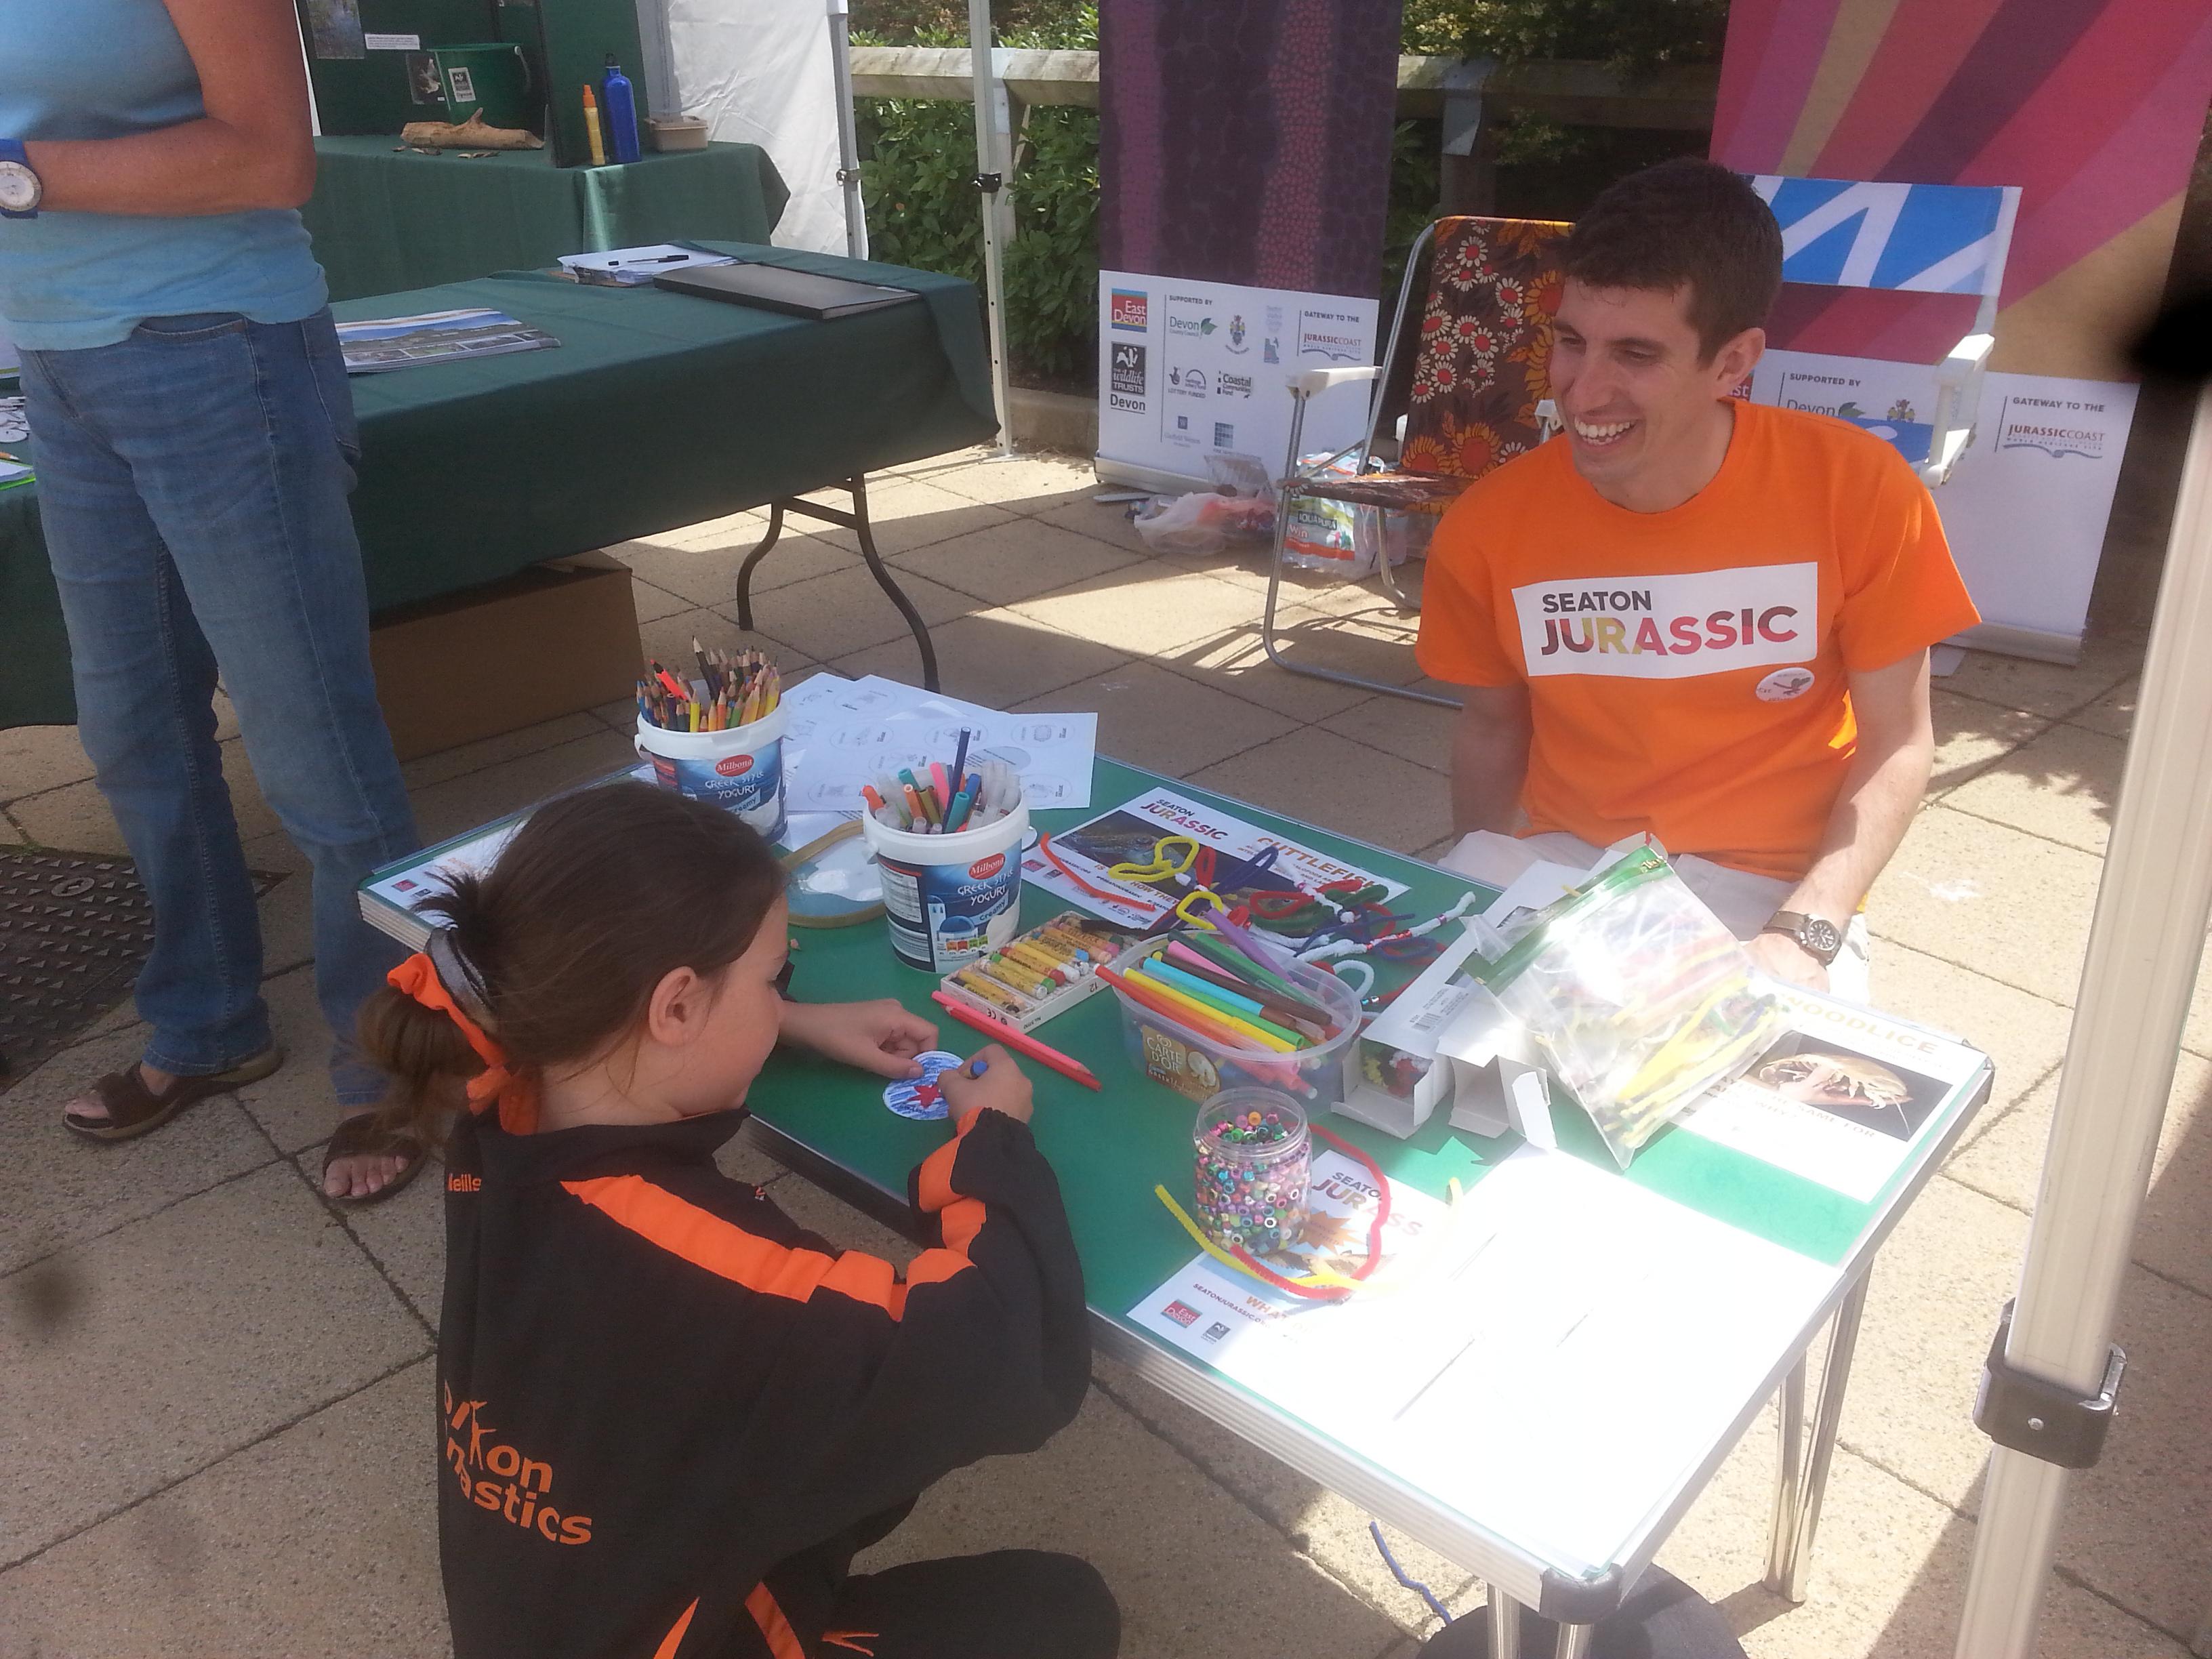 Seaton Jurassic Staff Running Badge Making Activity for Children